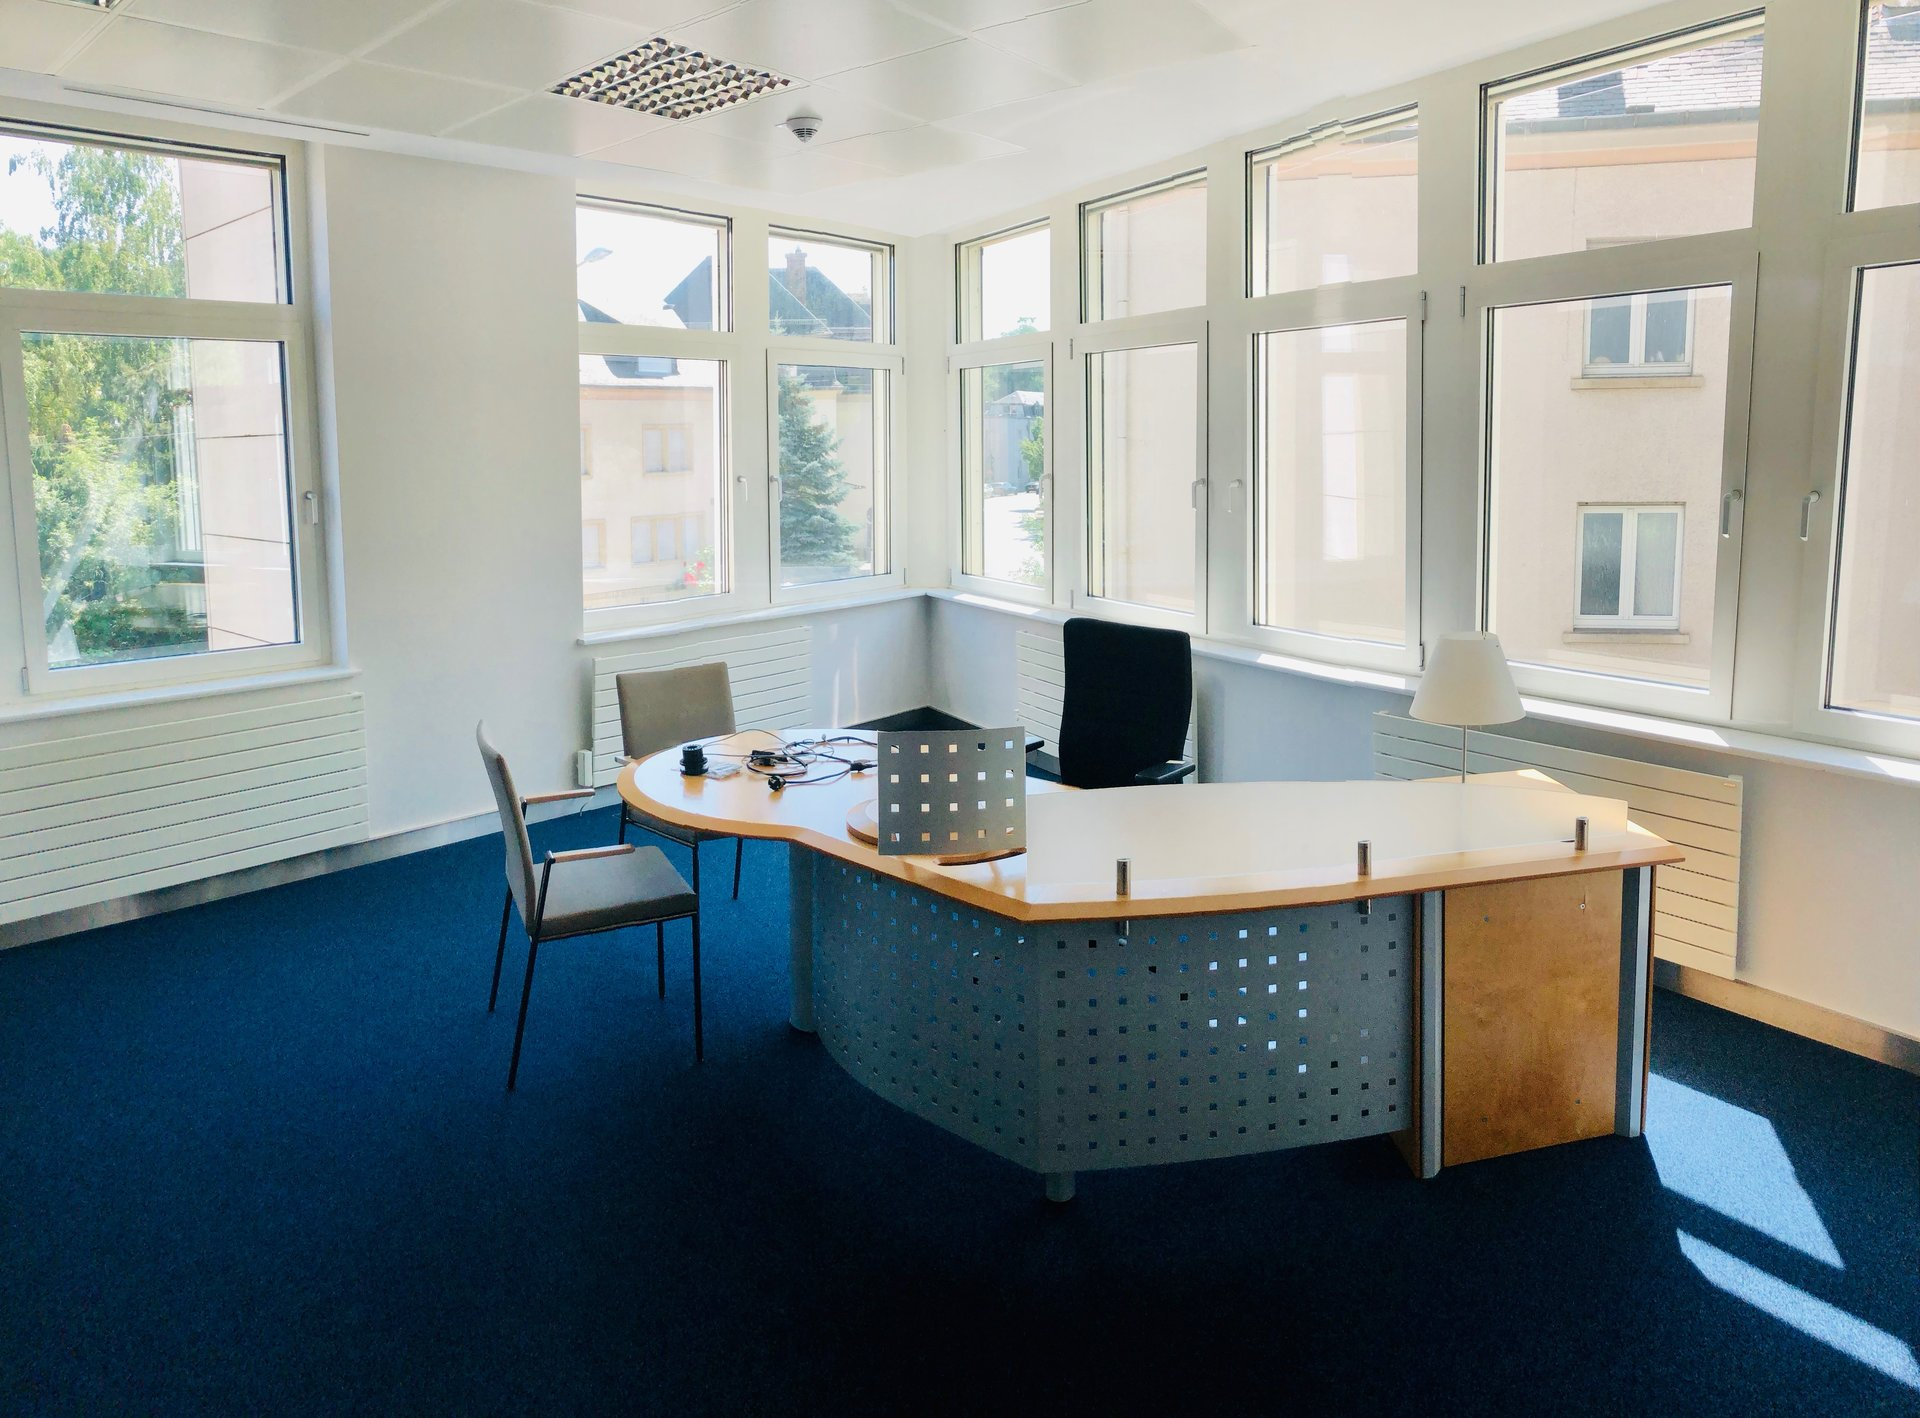 Location Bureau - Luxembourg Rollingergrund - Luxembourg